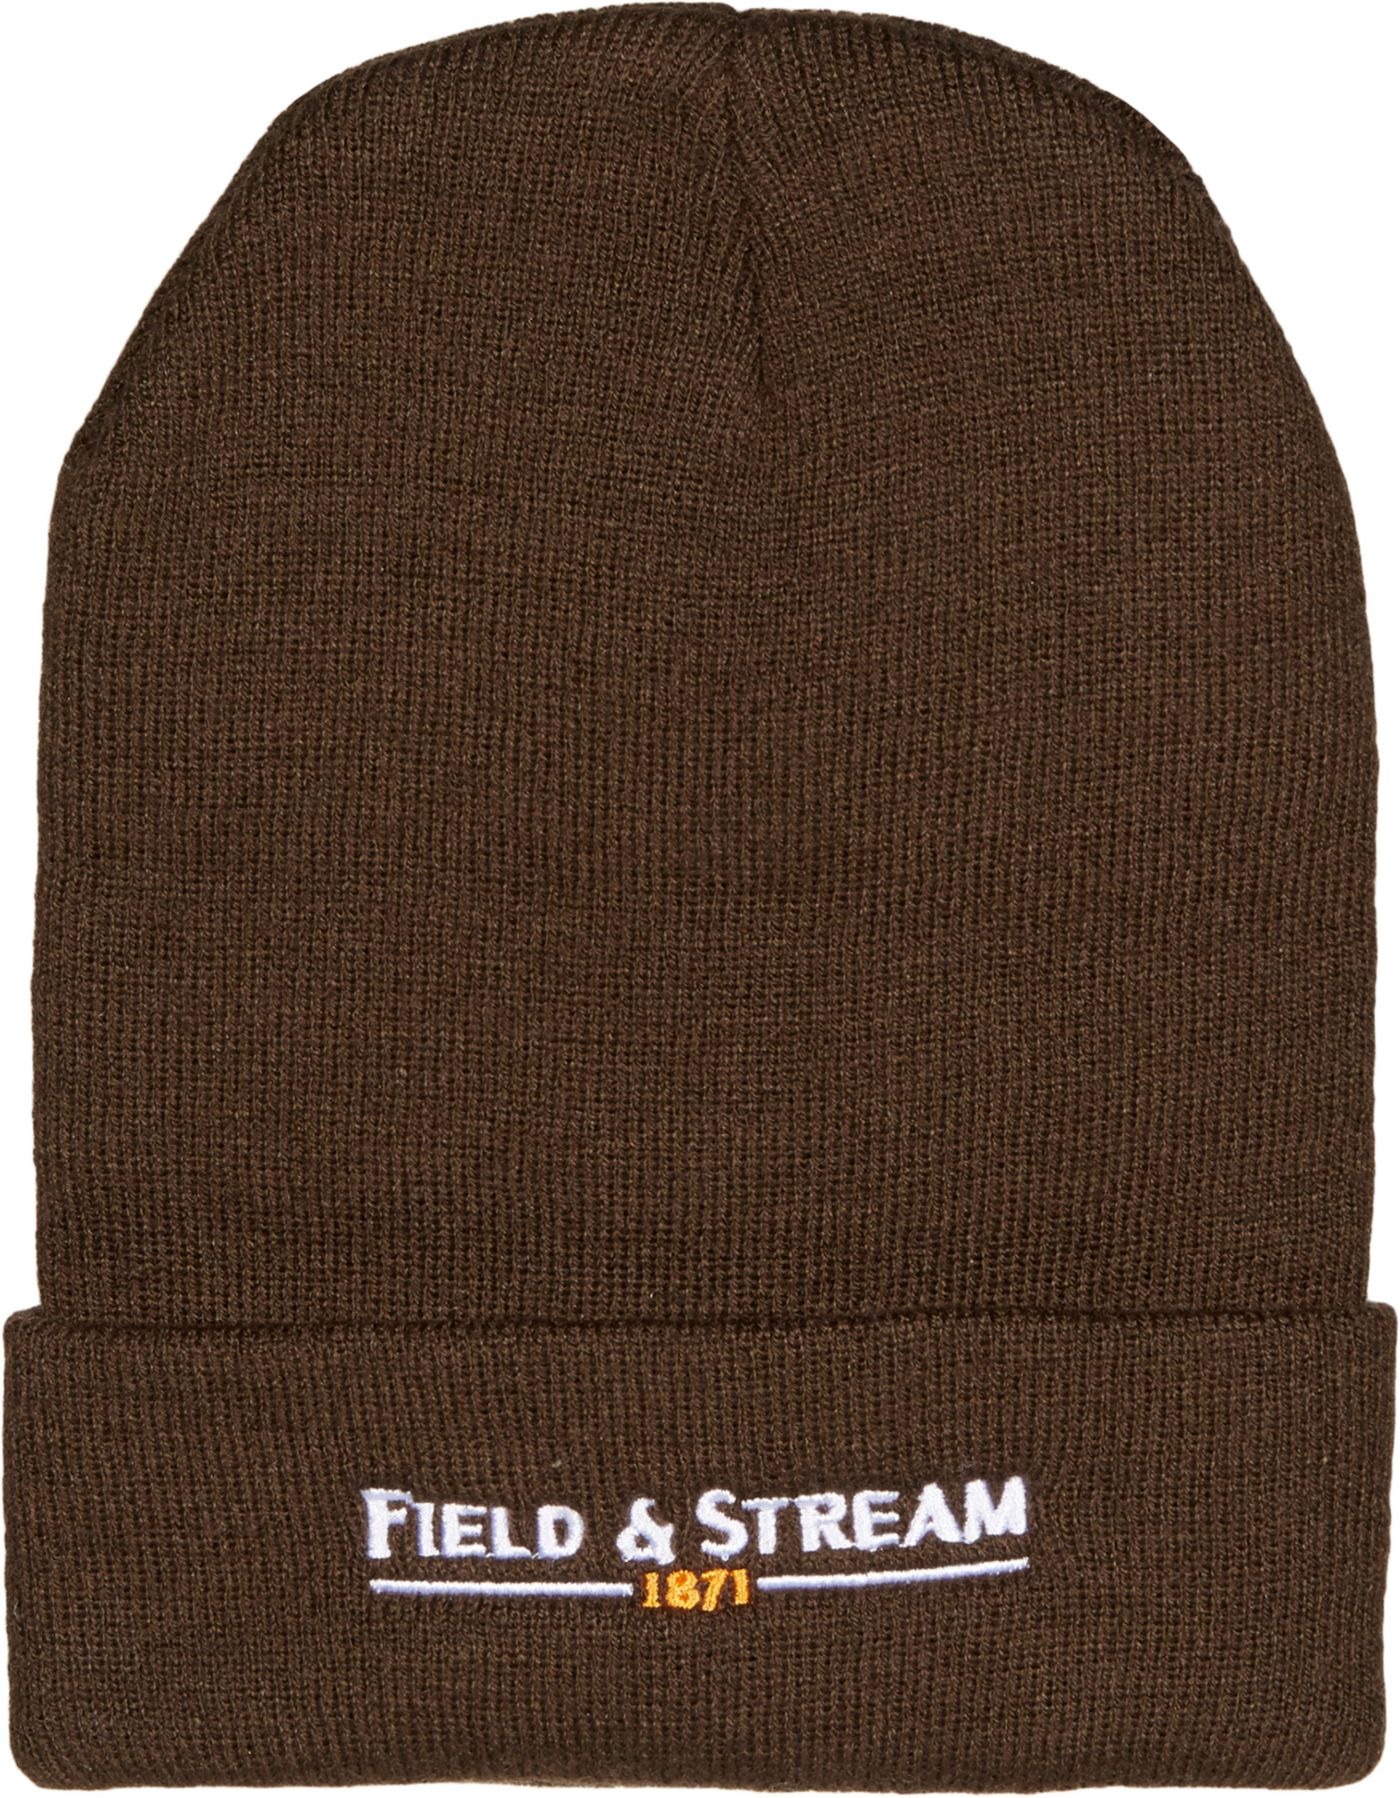 Field & Stream Men's Knit Beanie